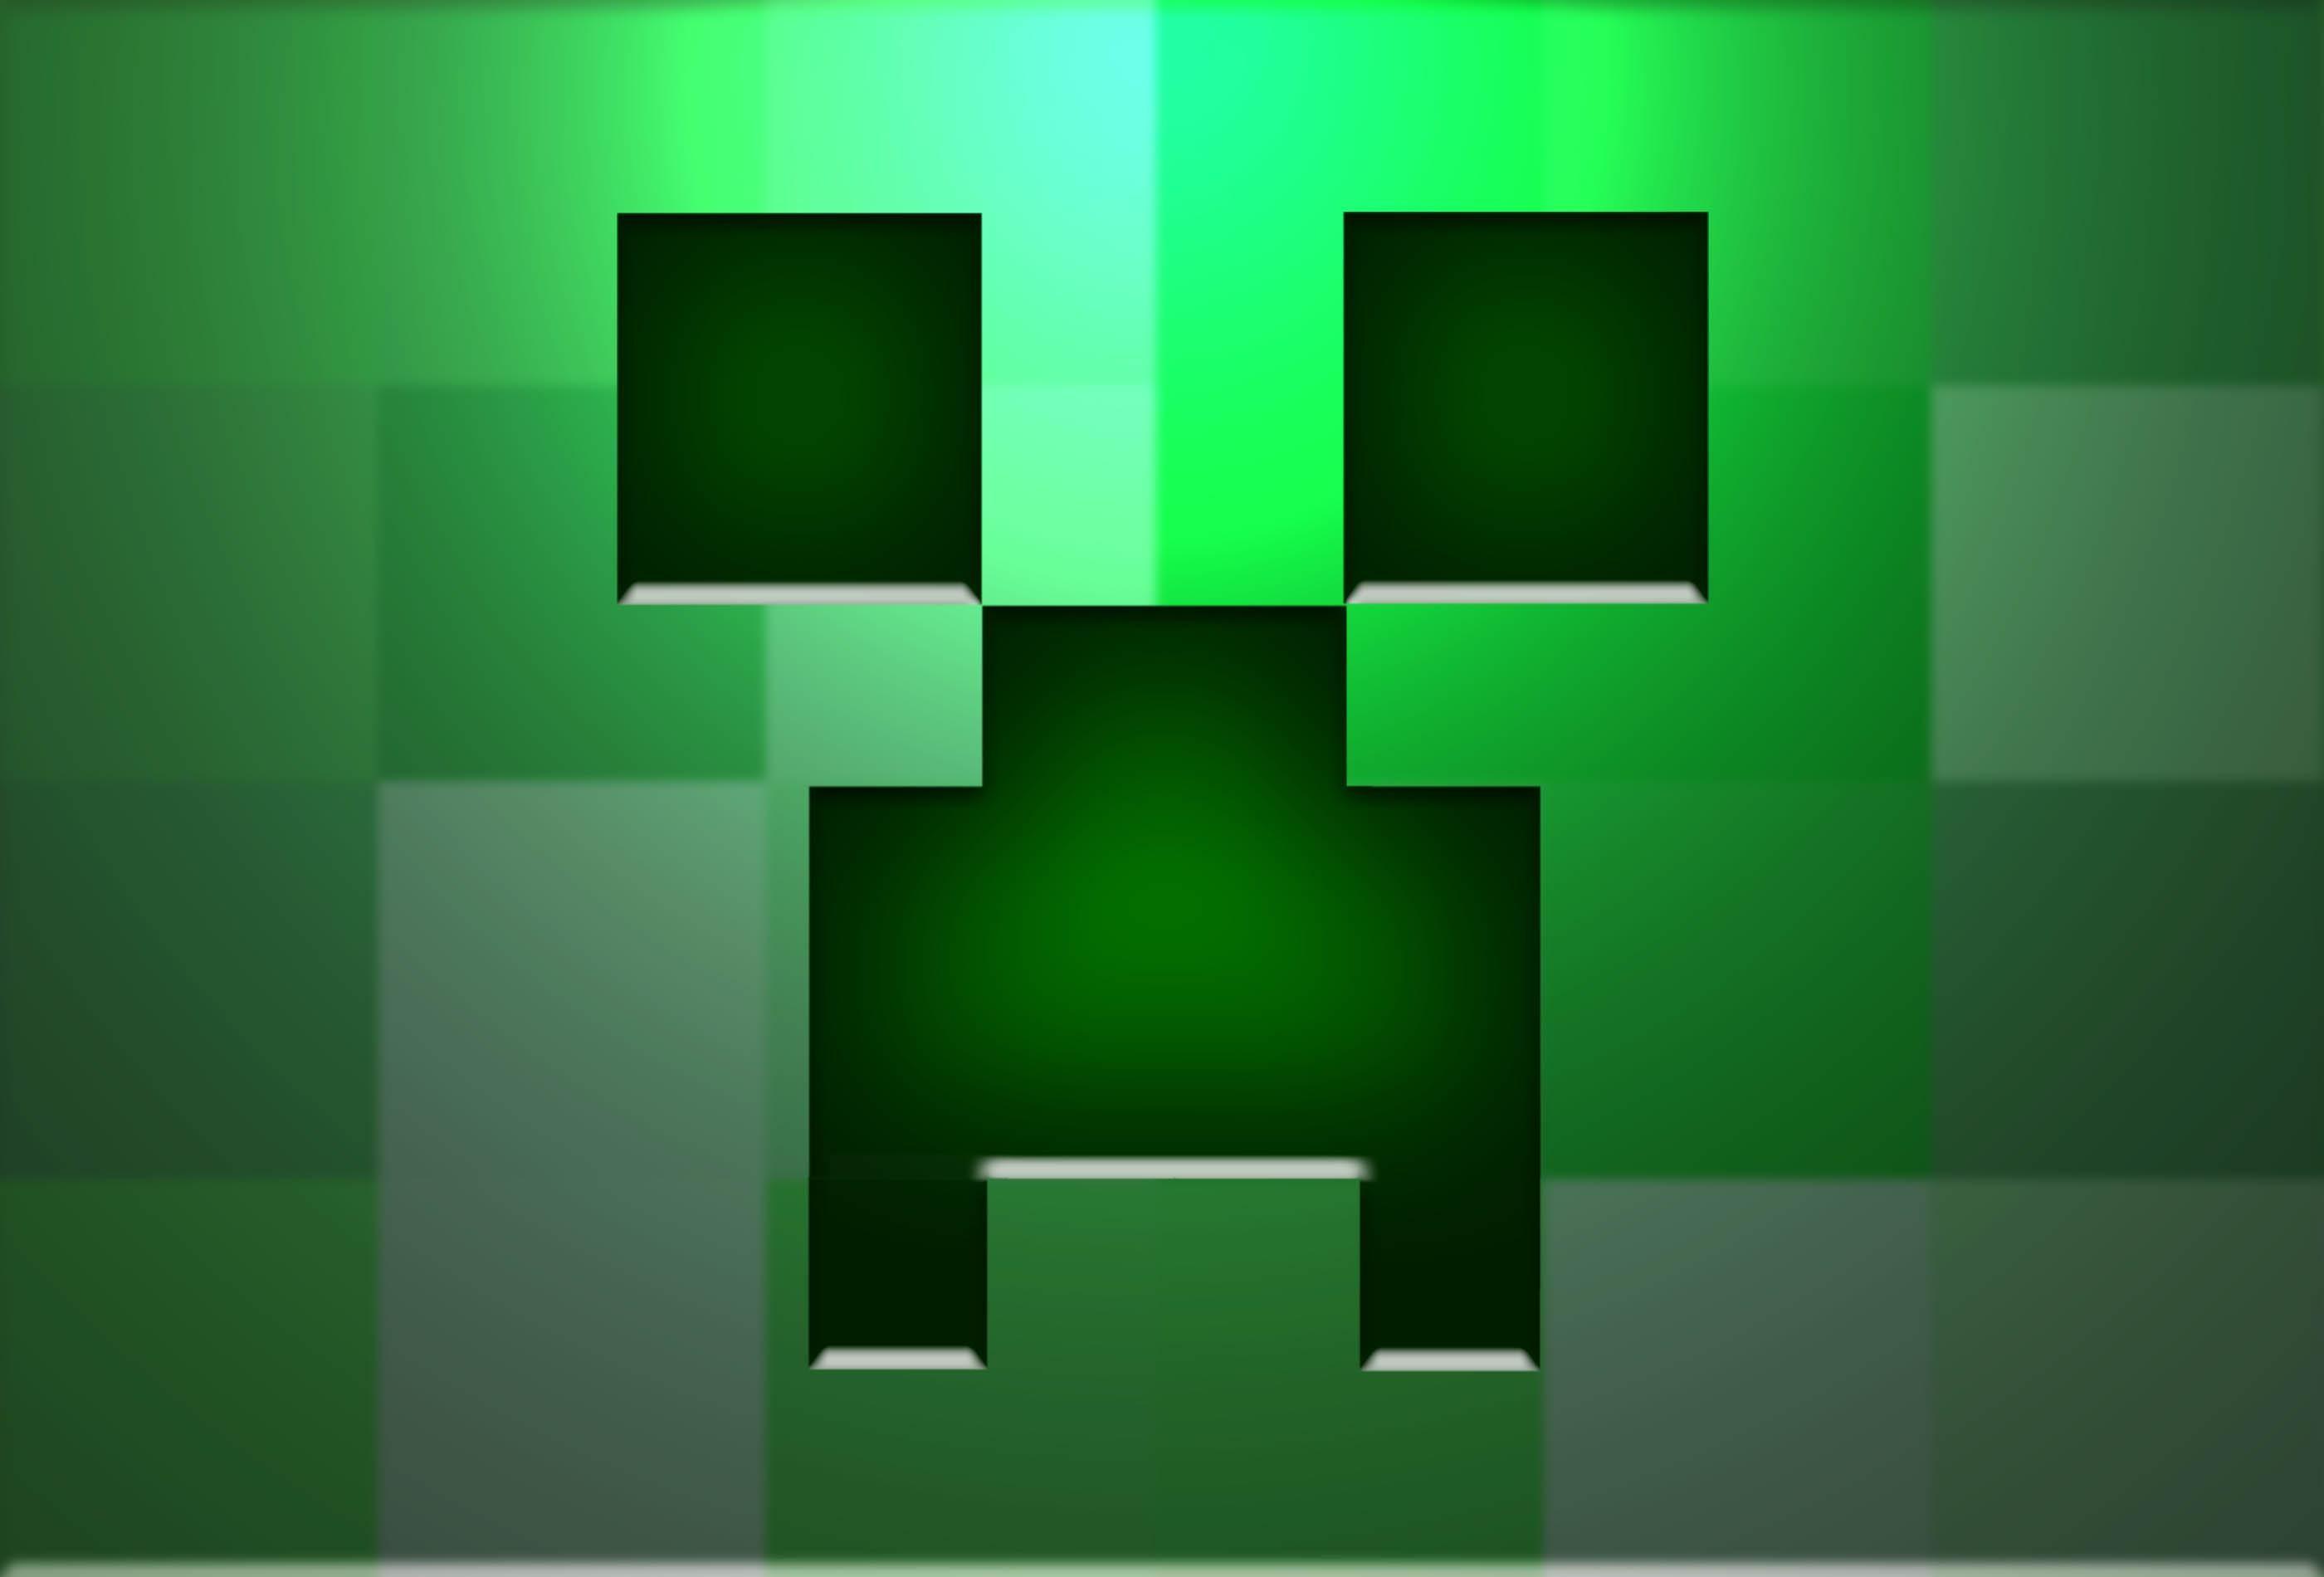 Cool Wallpaper Minecraft Green - 12b3541f69aea32300efde1669a4ac49  Image_518293.jpg